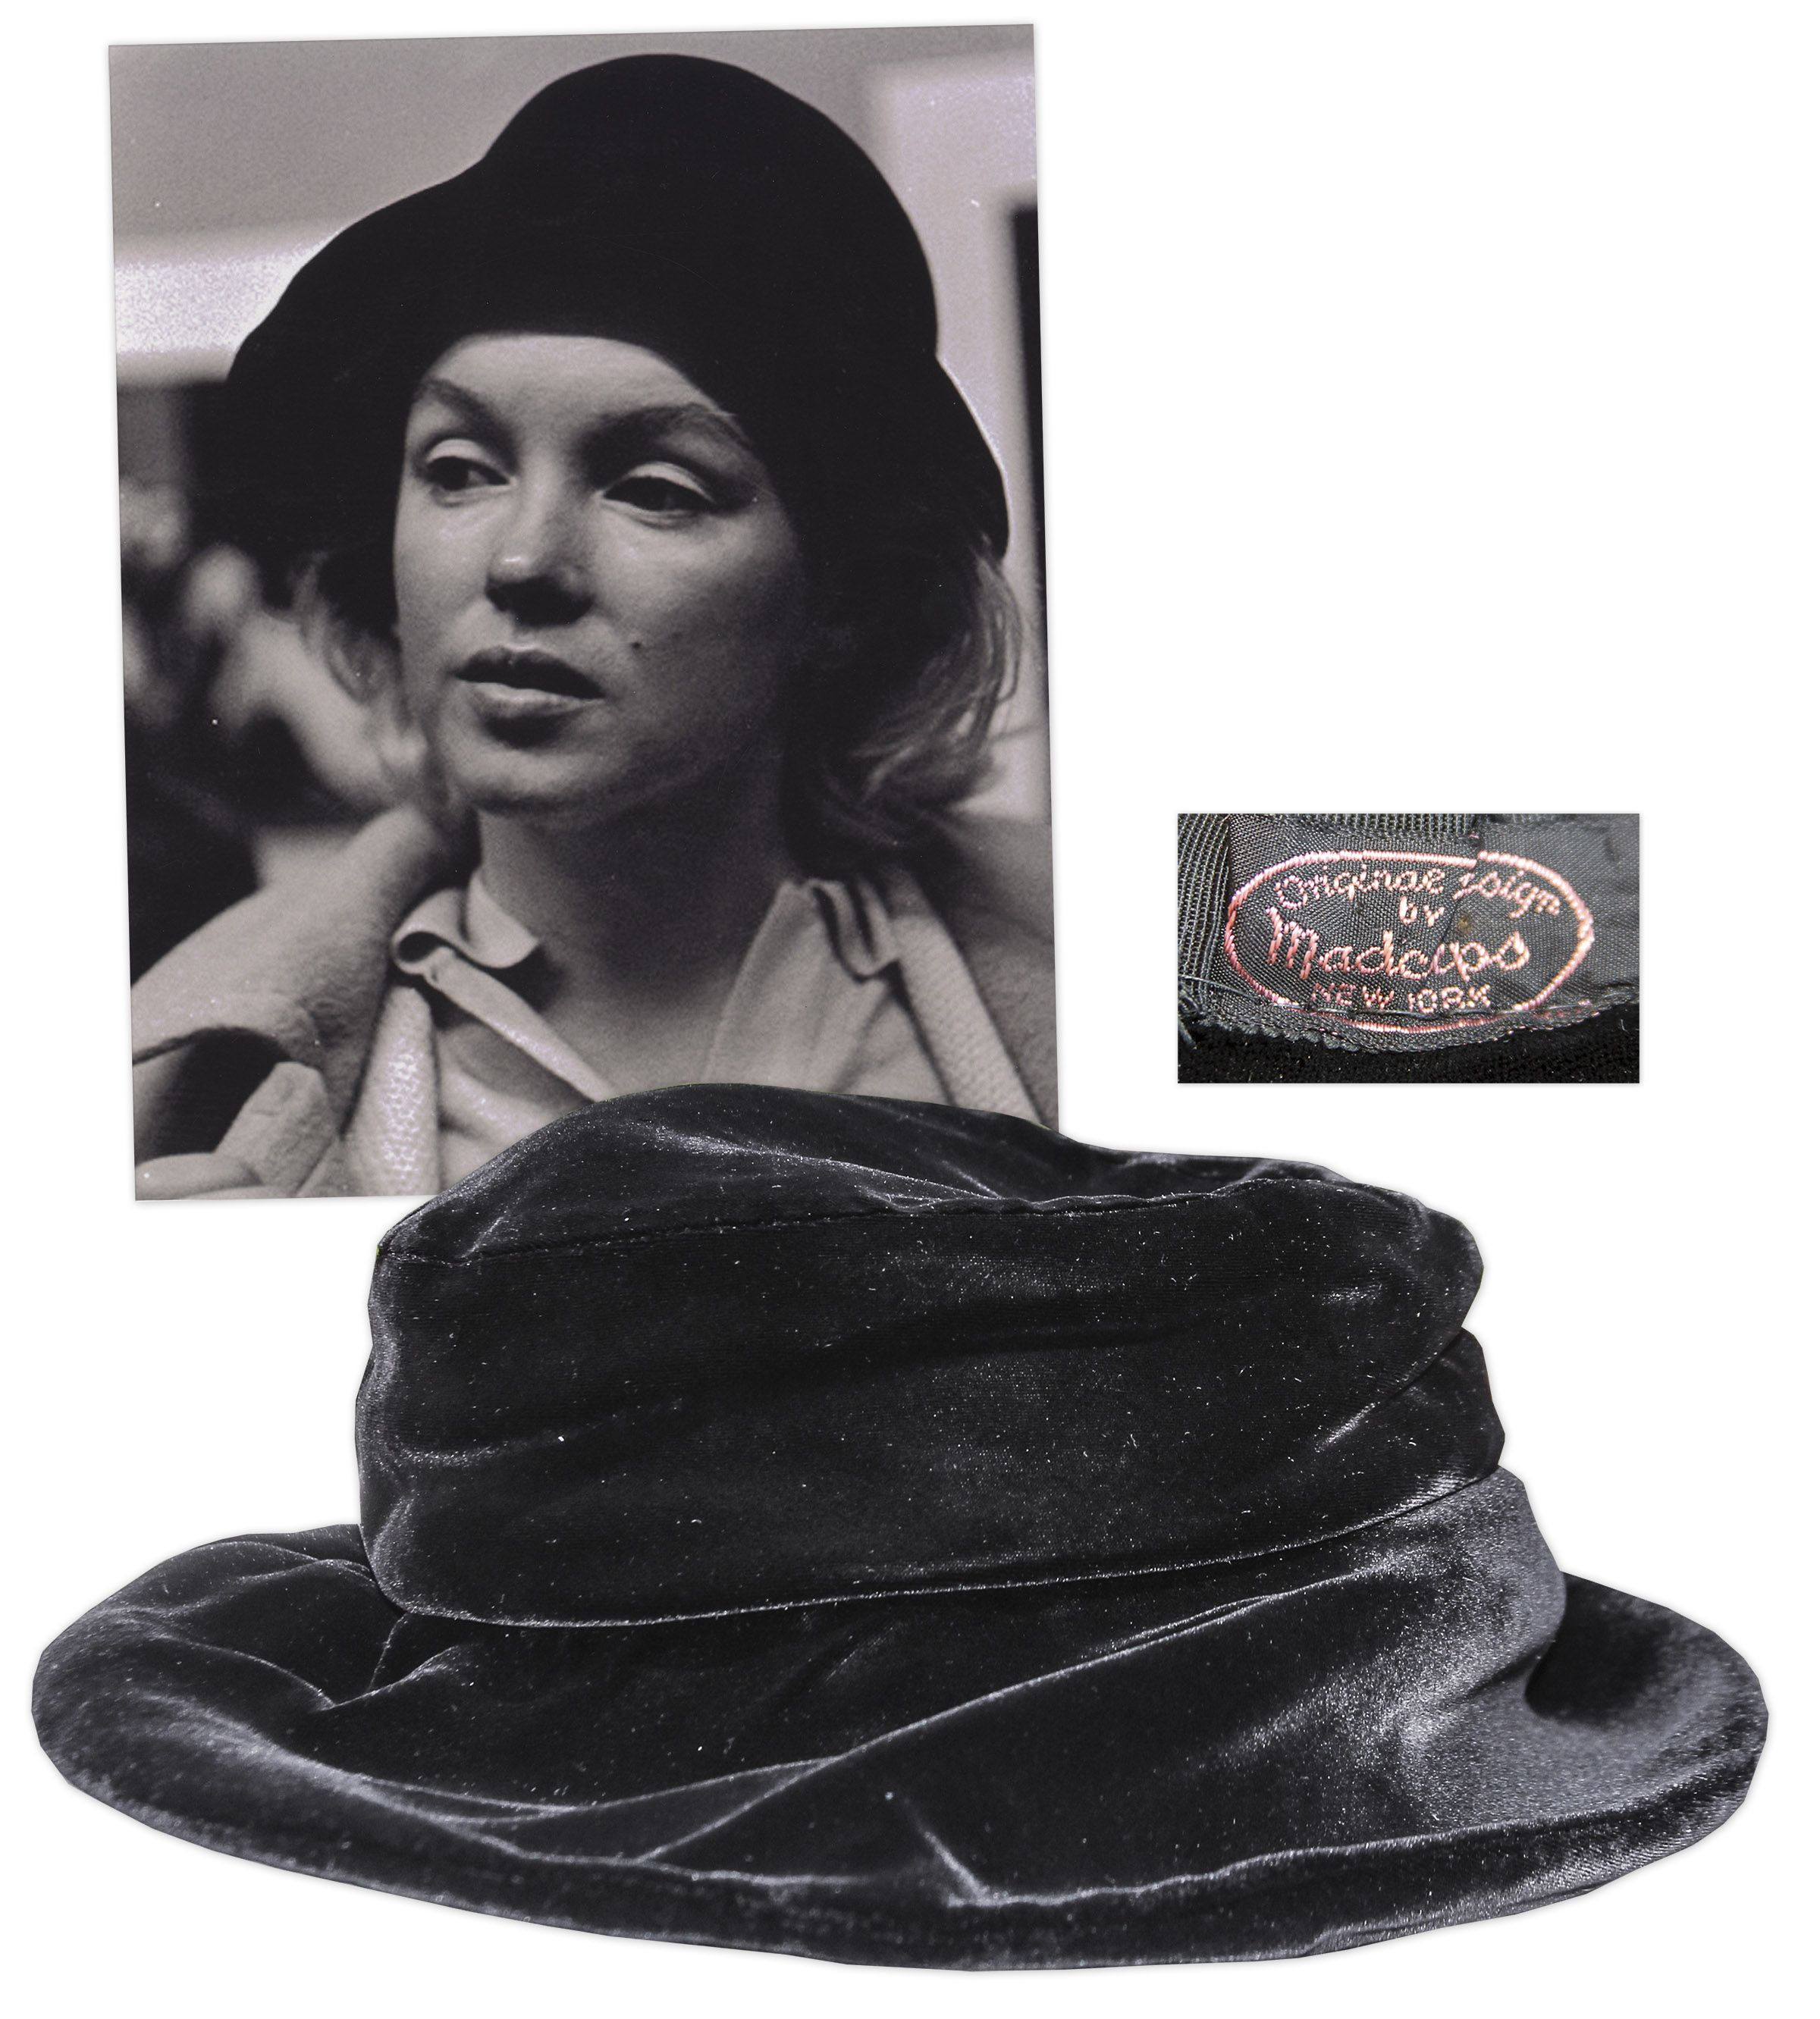 Black velvet floppy hat with upturned brim 7290b633a85